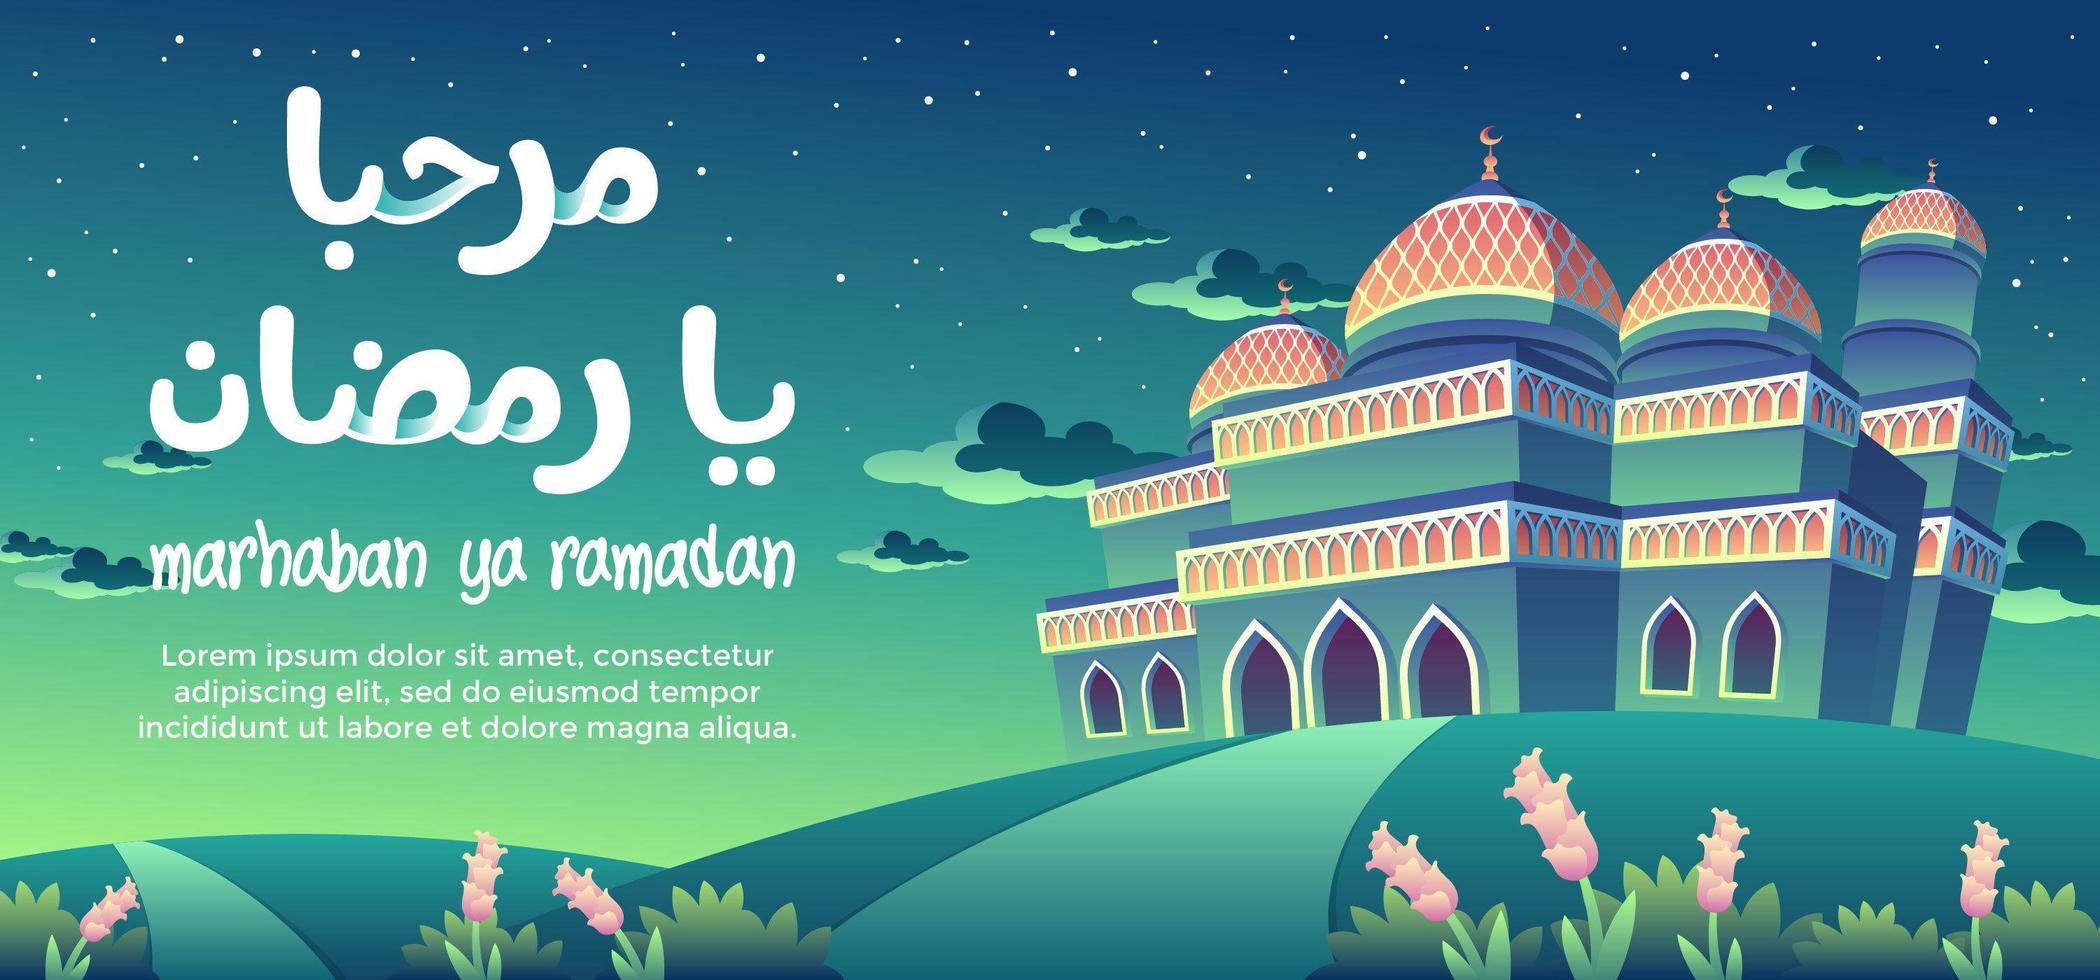 Marhaban Ya Ramadan With The Orange Pattern Green Mosque At Night vector